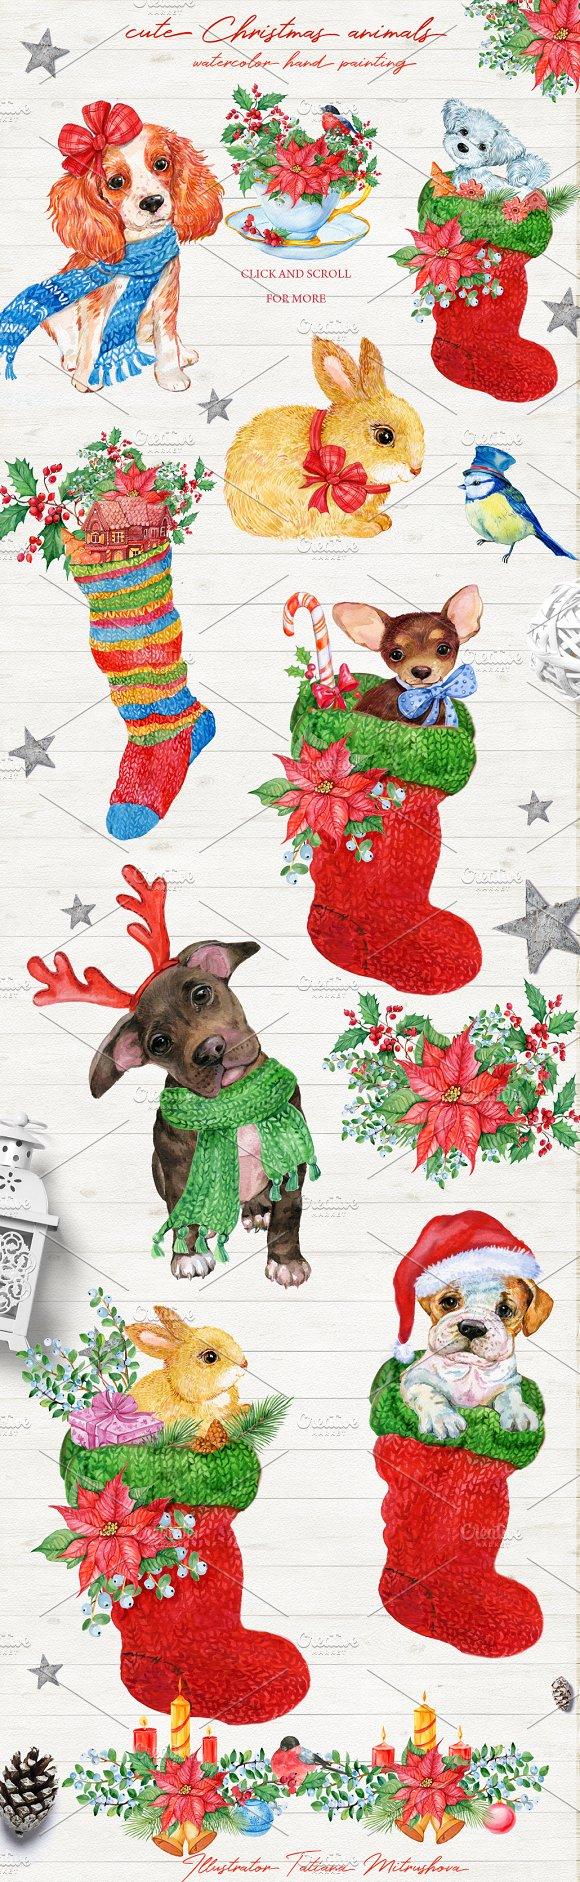 Merry Christmas Animals.Merry Christmas Cute Animals